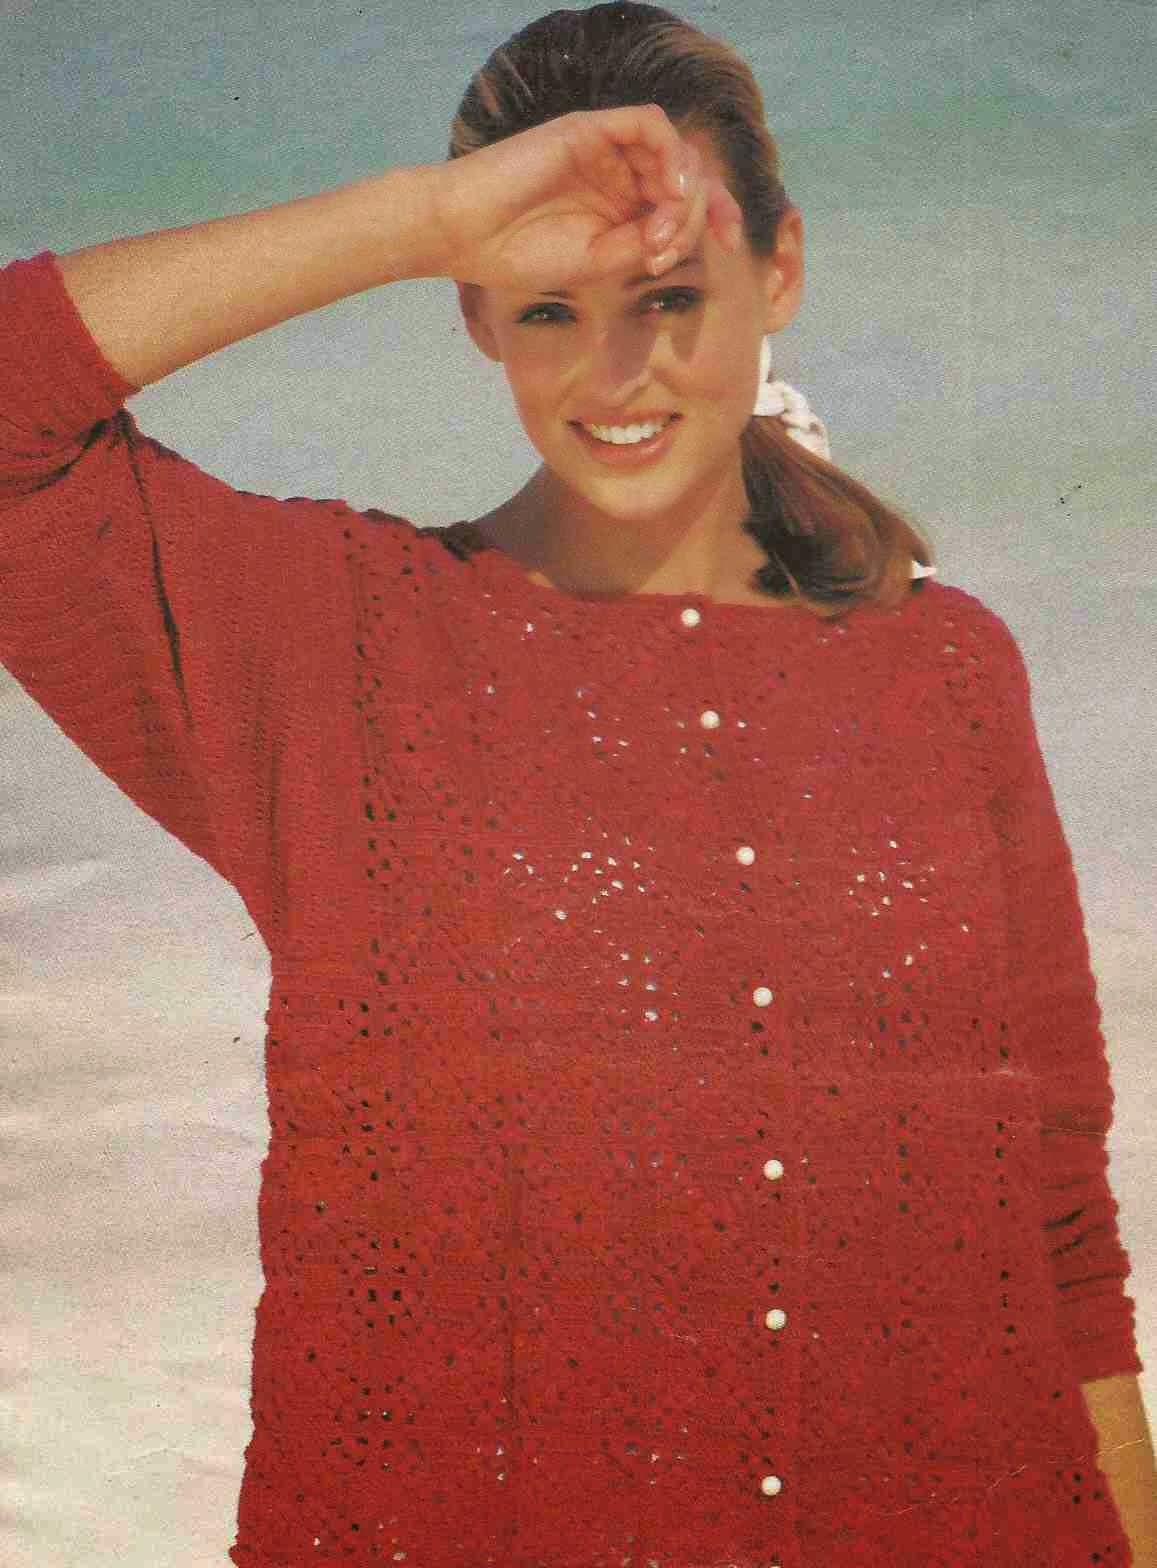 Chaqueta Roja a Crochet o Ganchillo